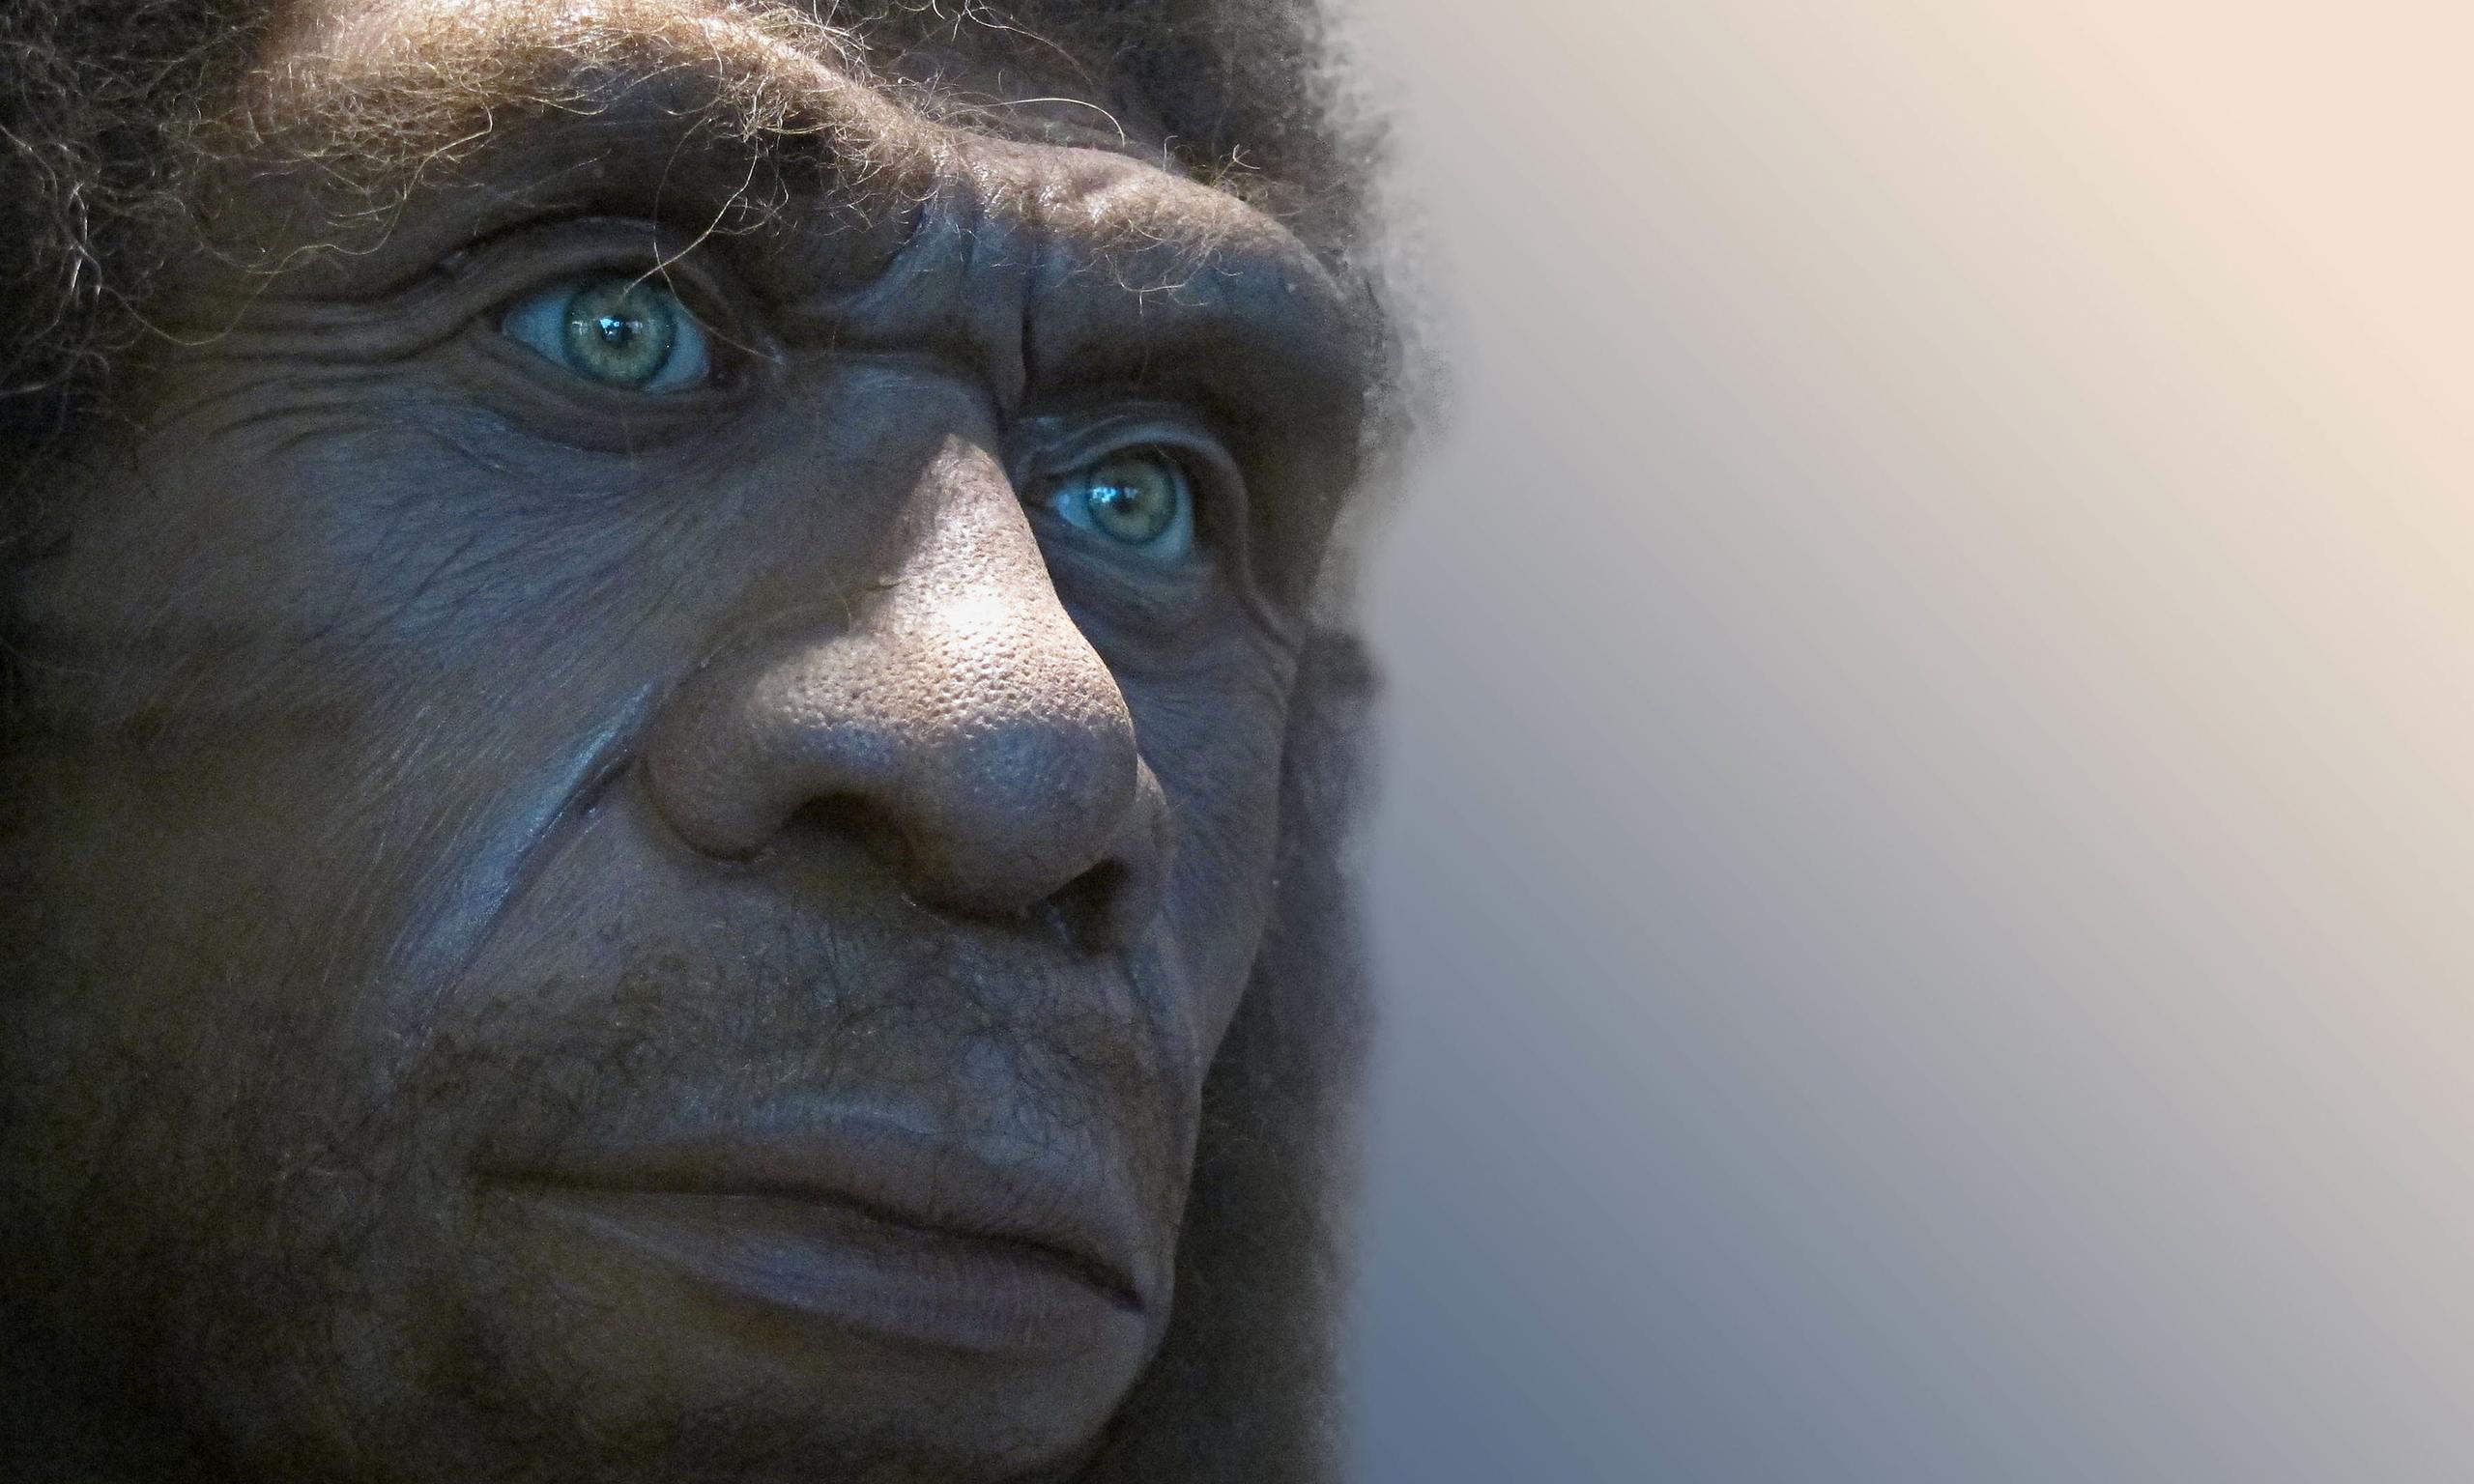 neanderthal_man_face_hair